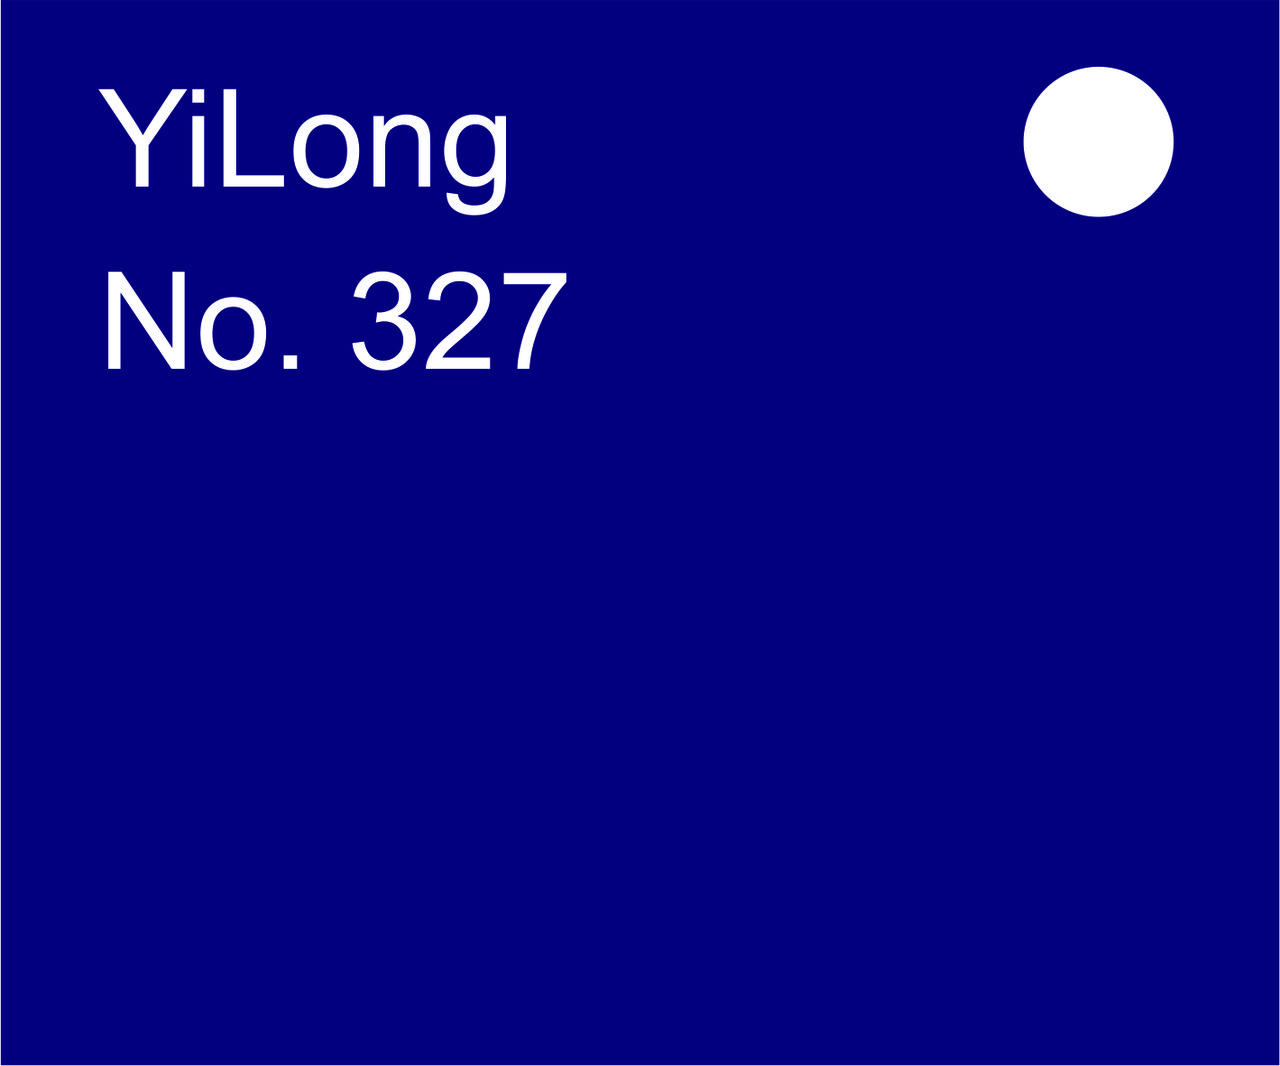 Акрил темно-синий 3мм (1,25м х 2,48м)